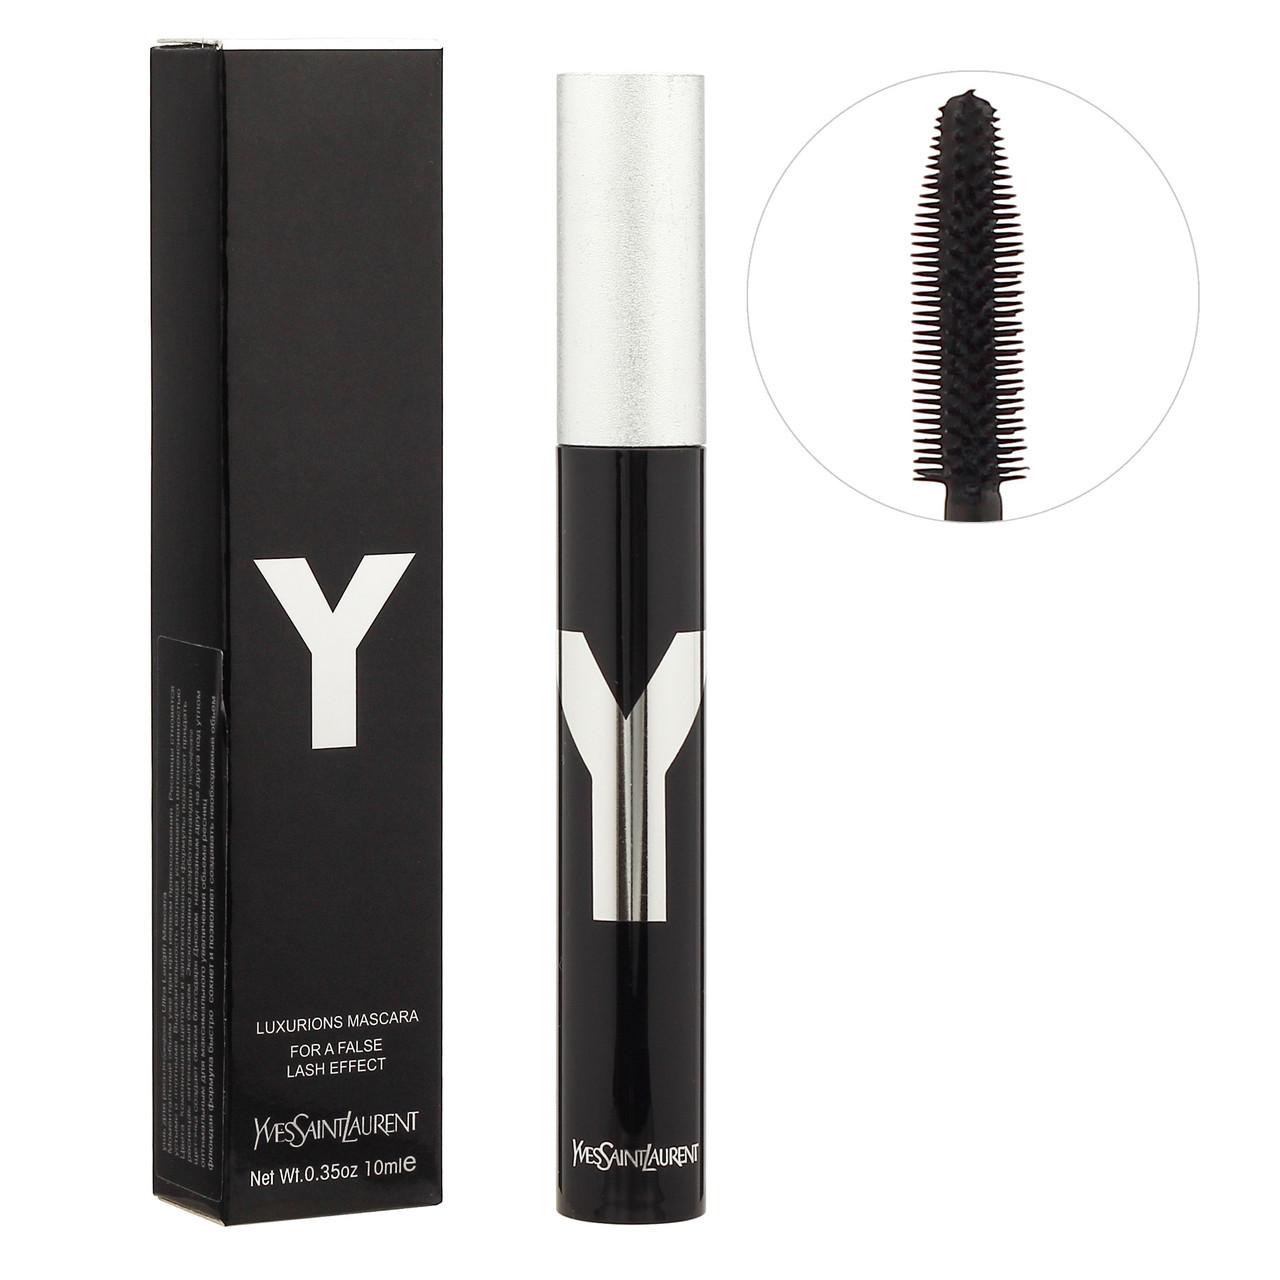 Тушь для ресниц YSL Luxurions Mascara примятая упаковка